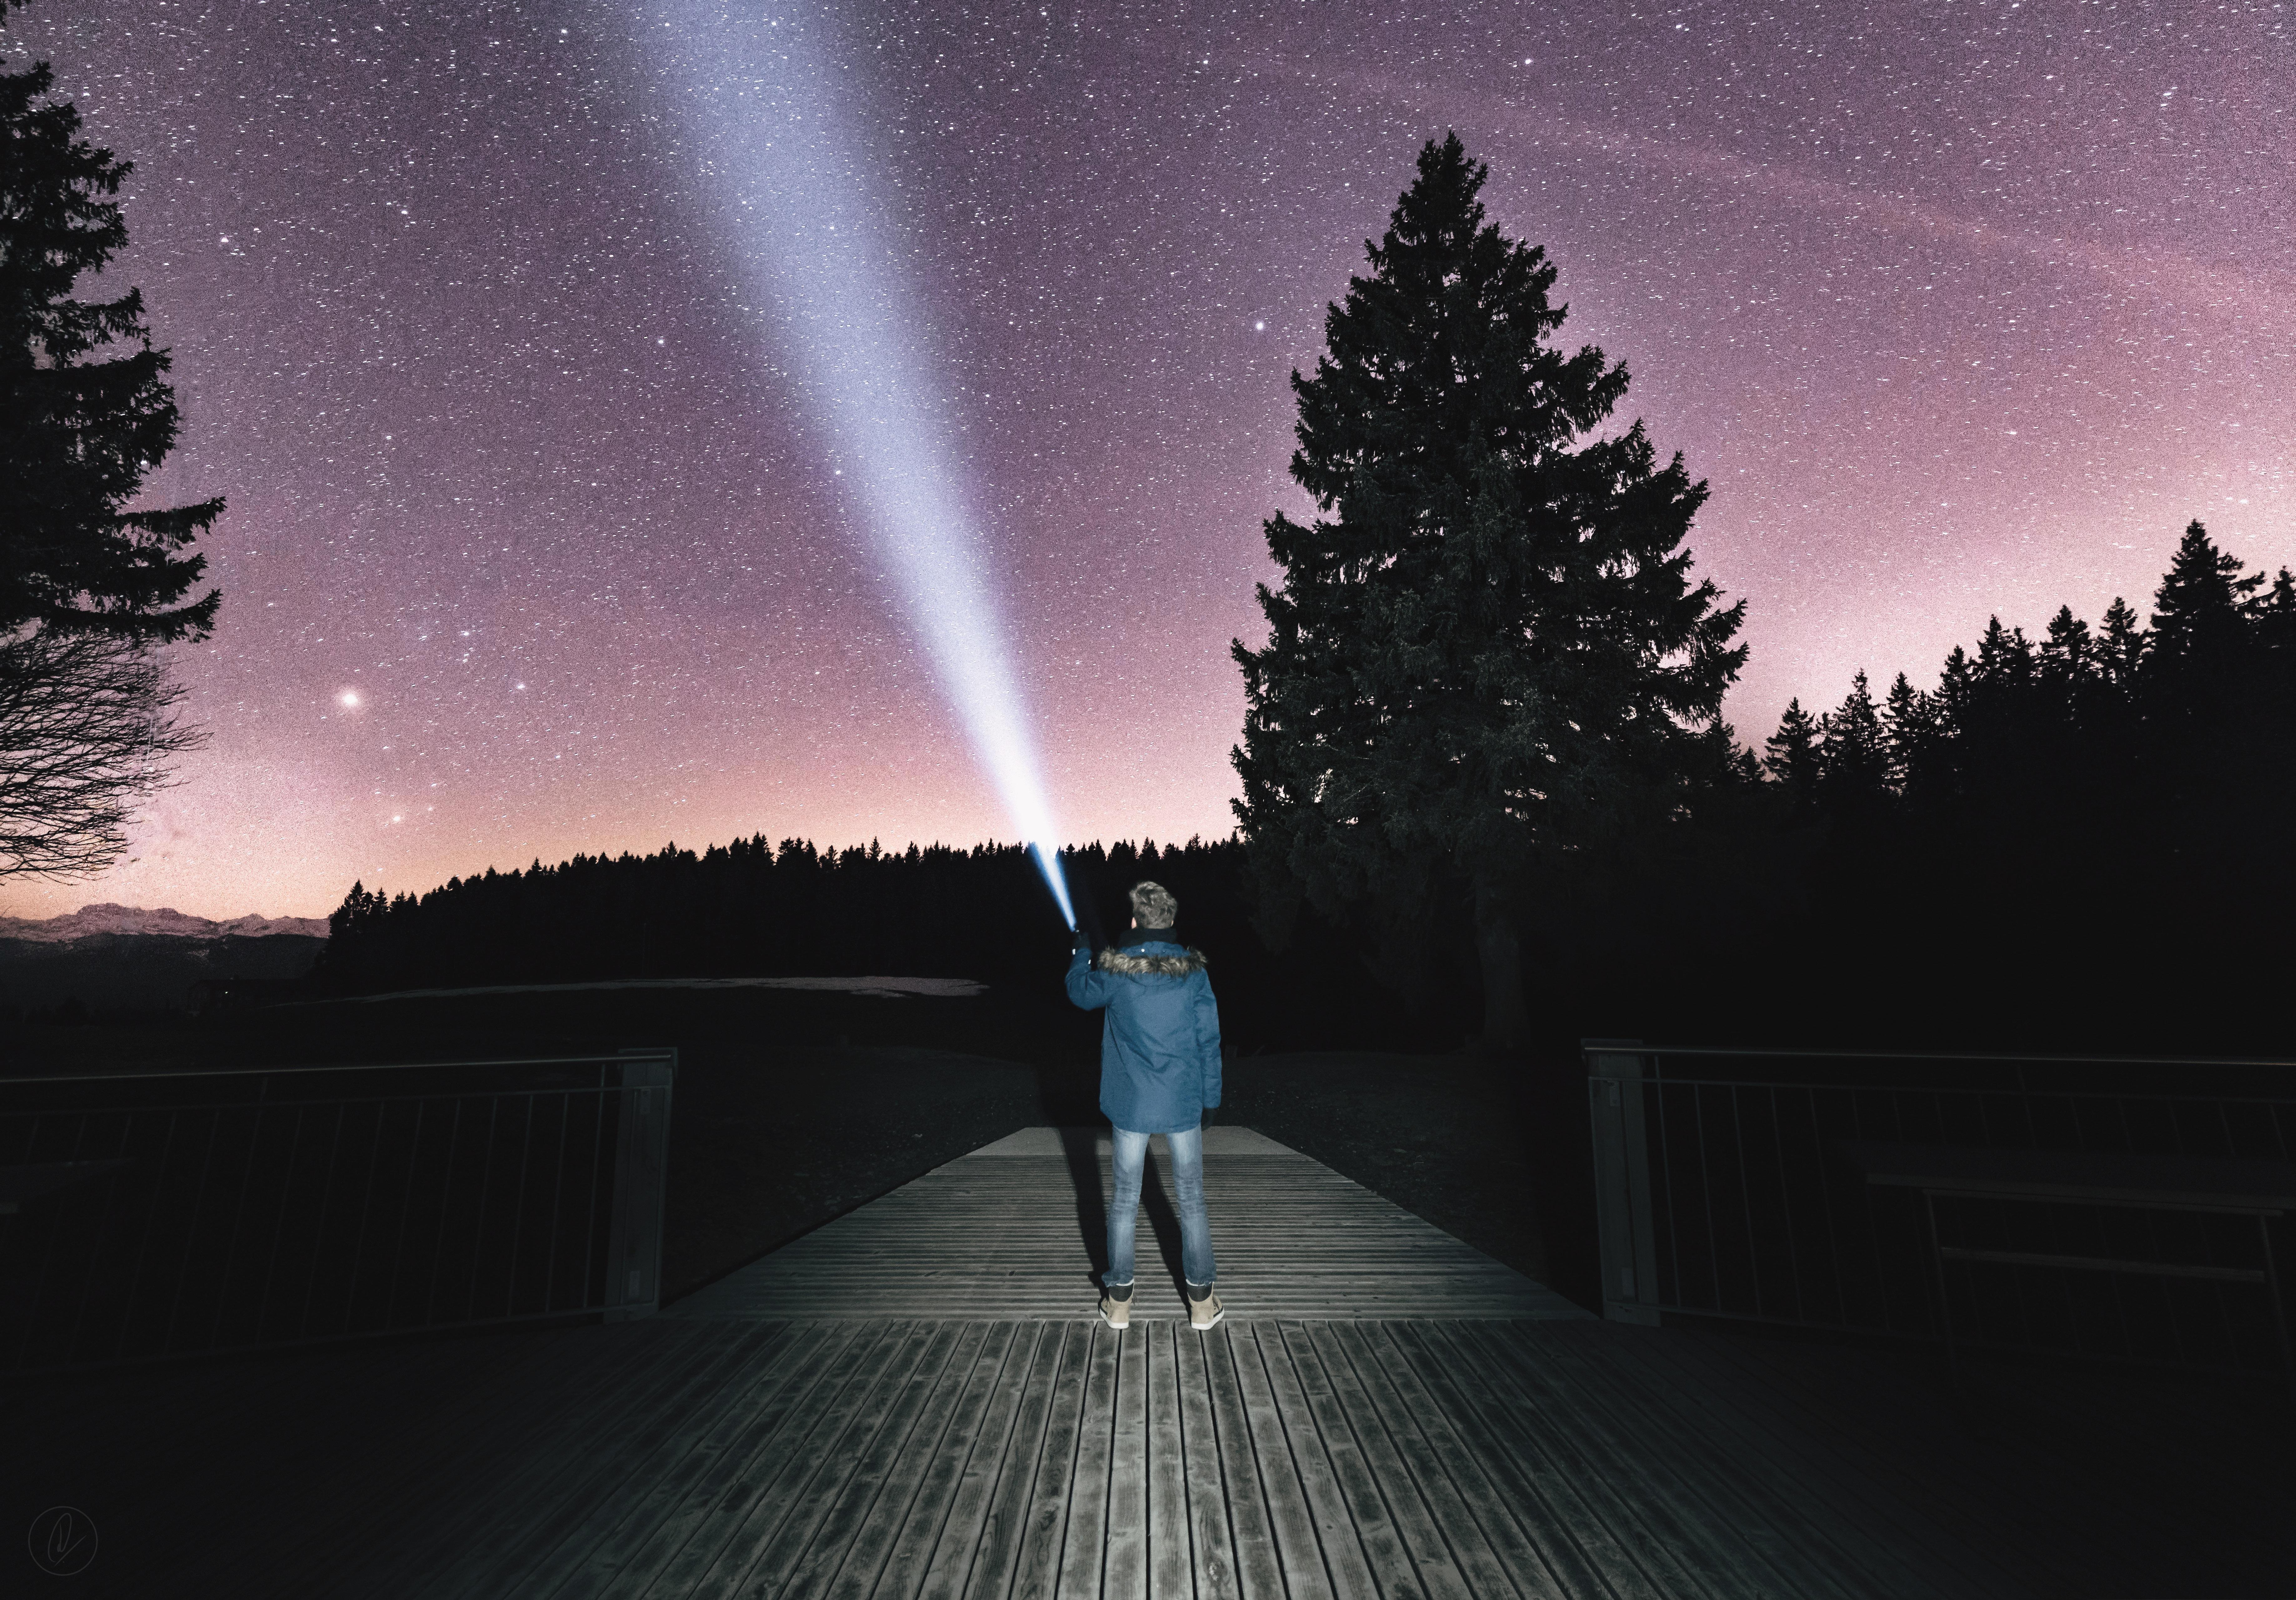 guy-holding-flashlight-to-the-purple-starry-night-sky